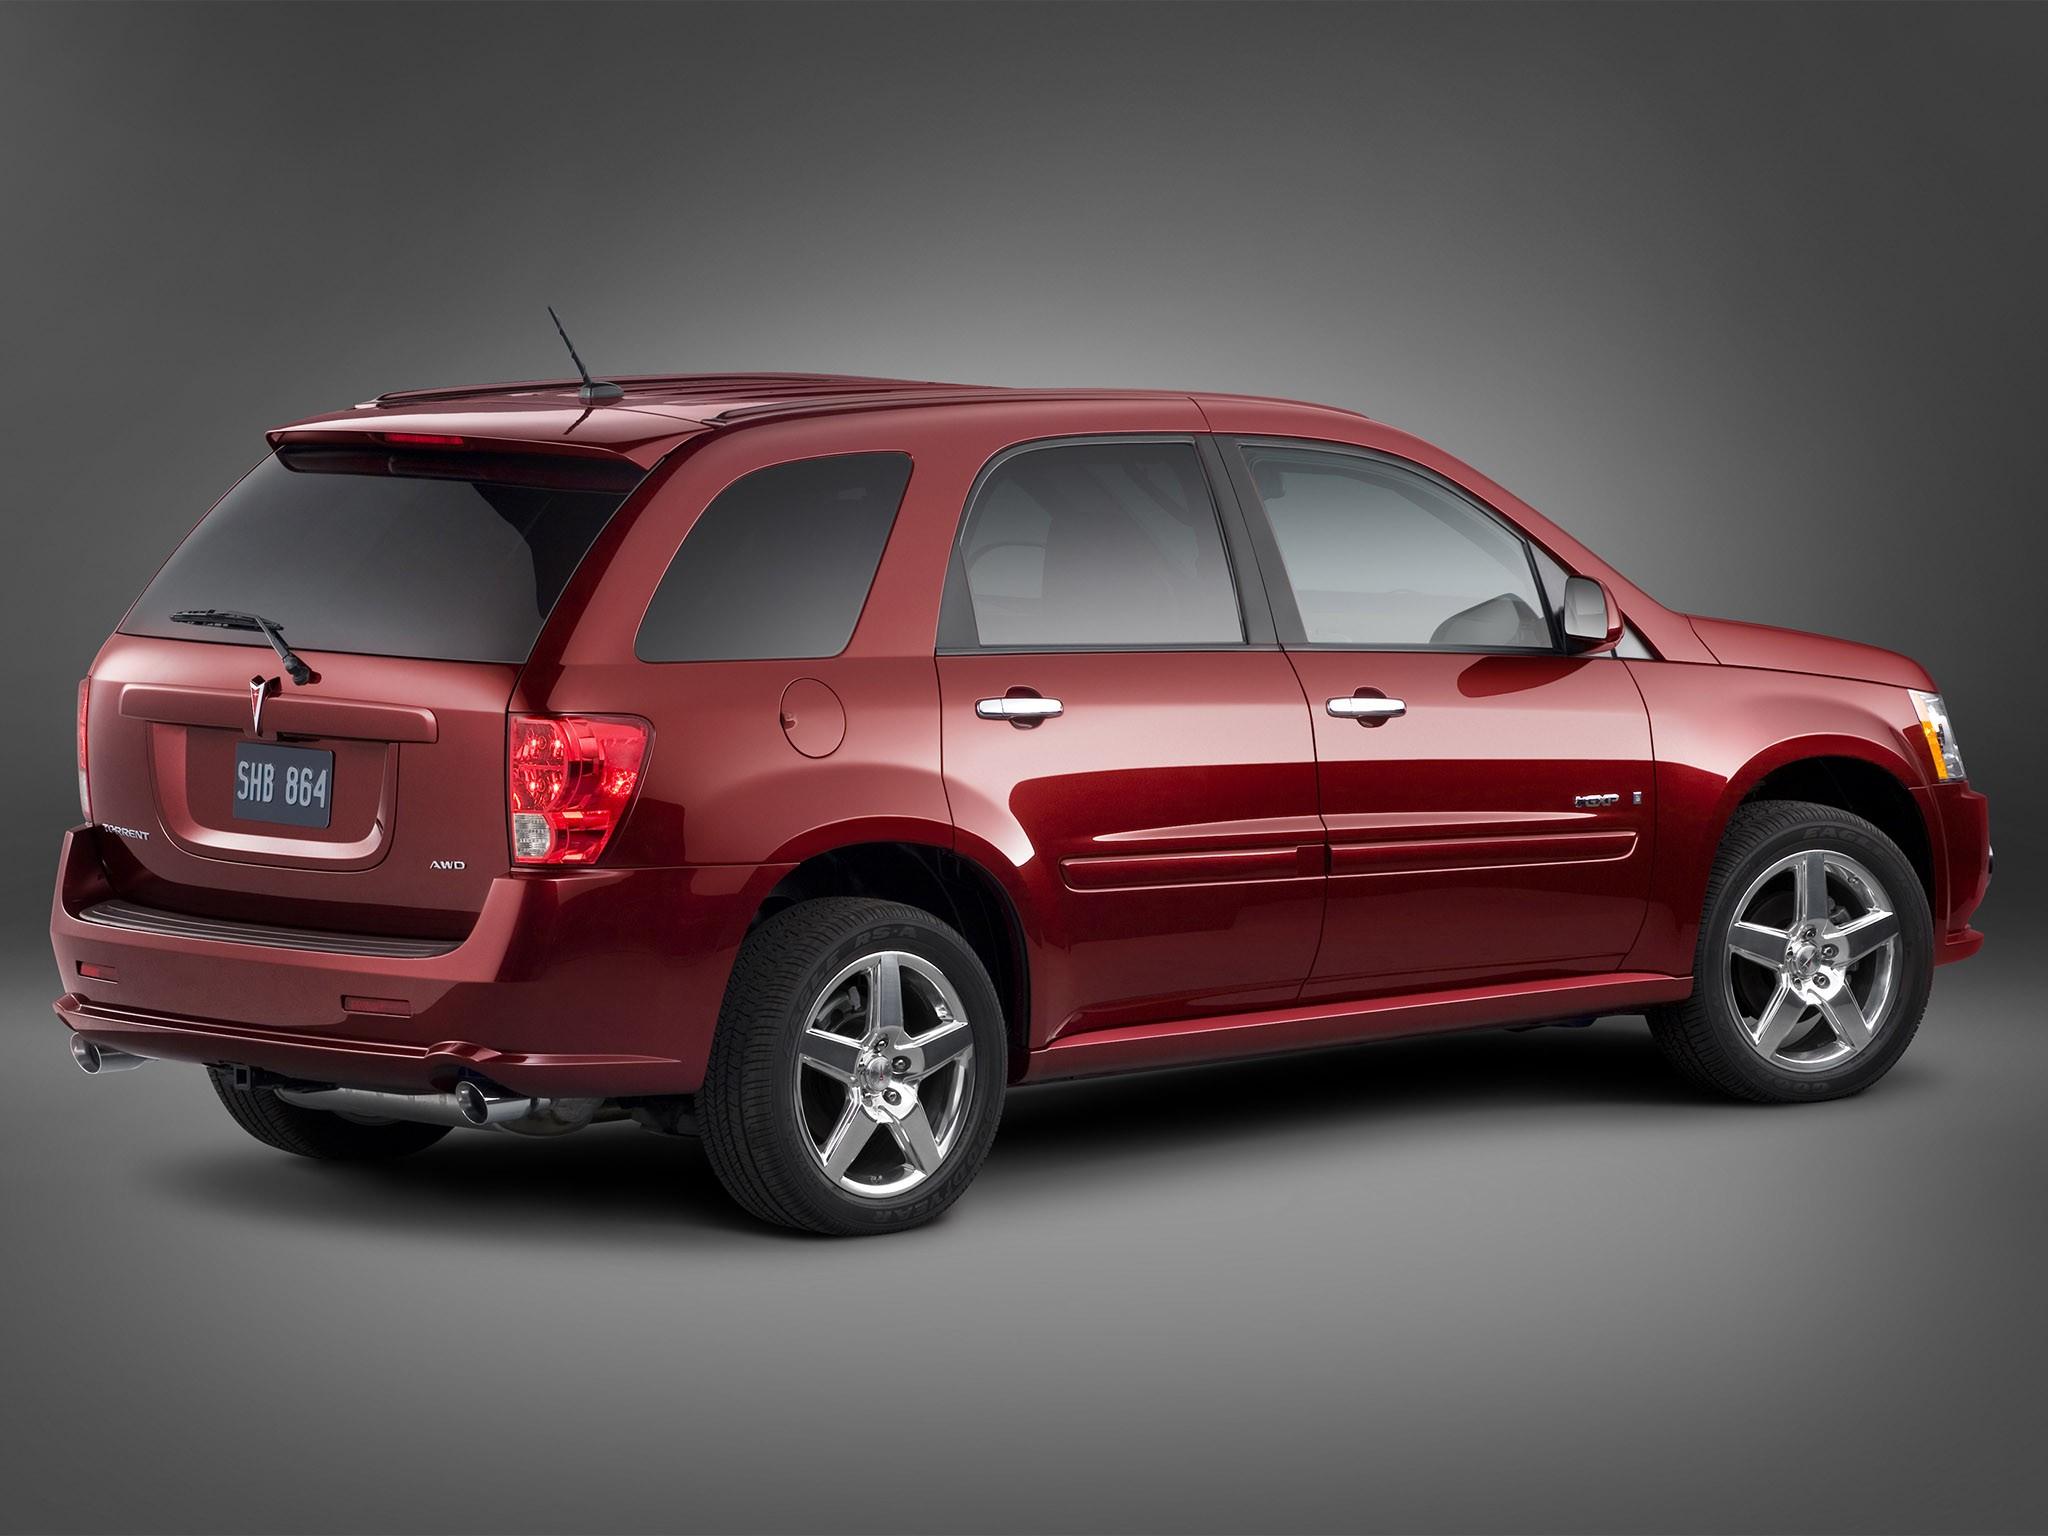 2008 Pontiac Torrent GXP